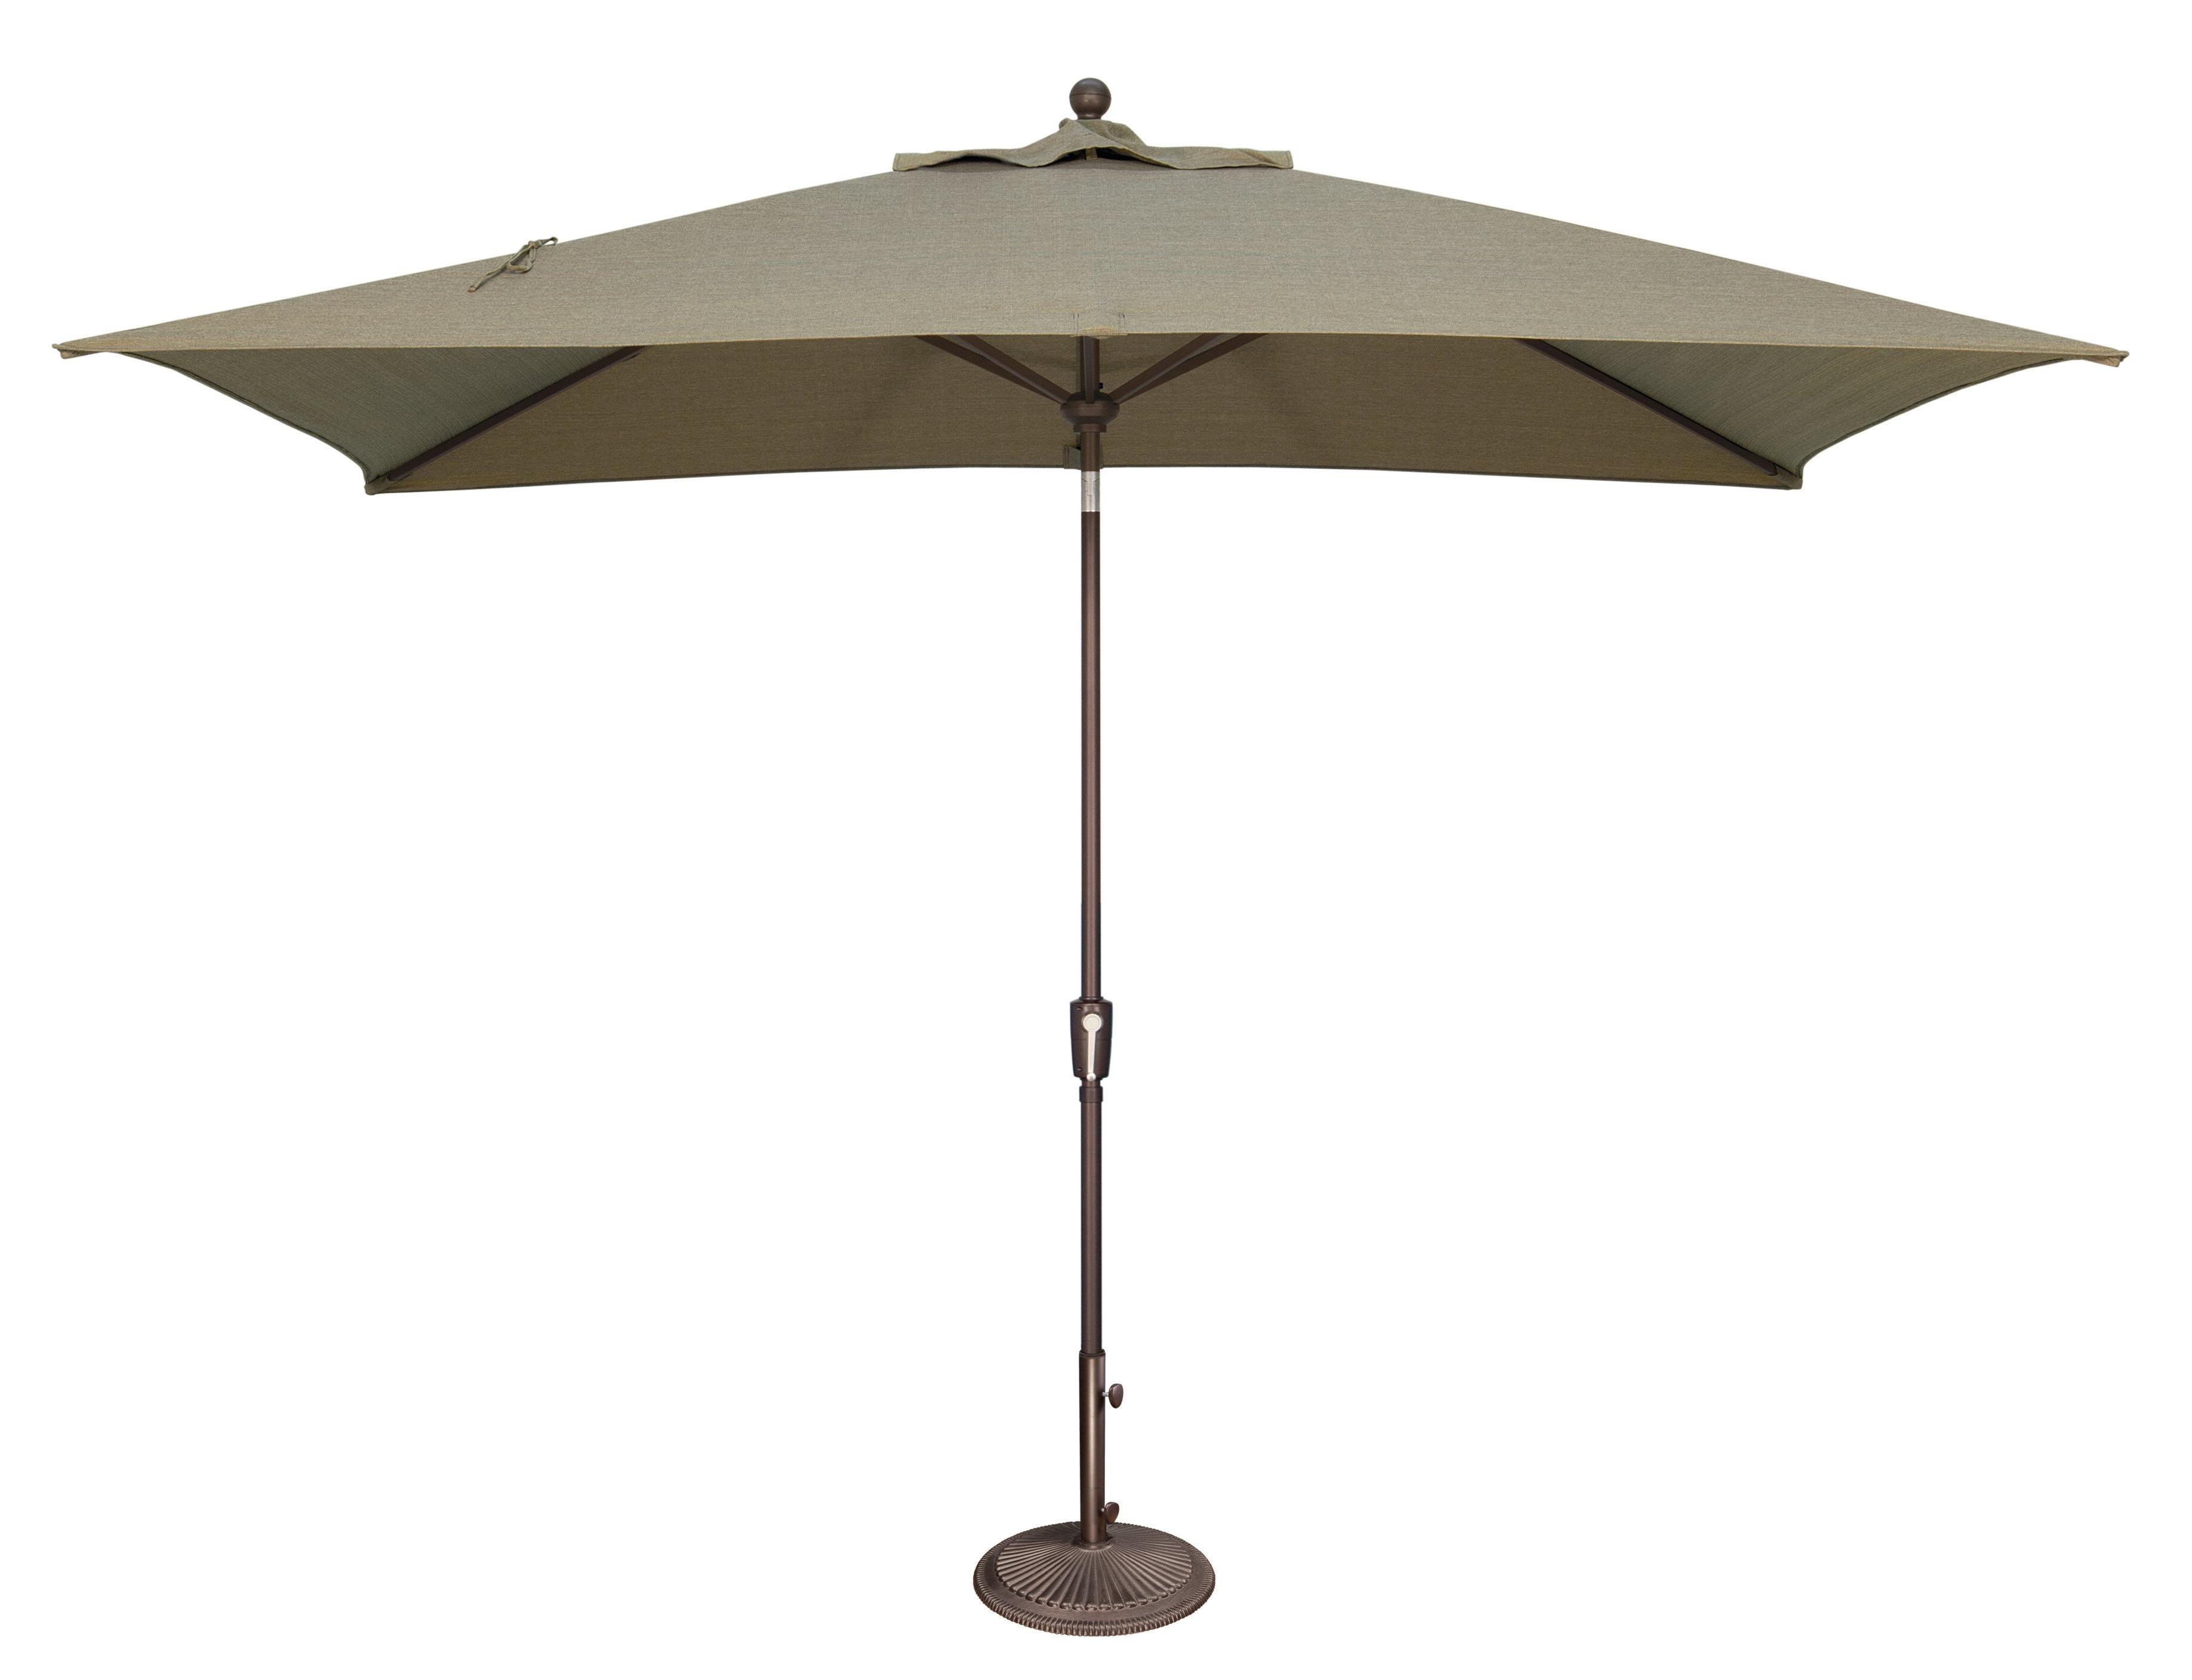 Mucci Madilyn Market Sunbrella Umbrellas Intended For 2020 Launceston 10' X 6.5' Rectangular Market Umbrella (Gallery 8 of 20)